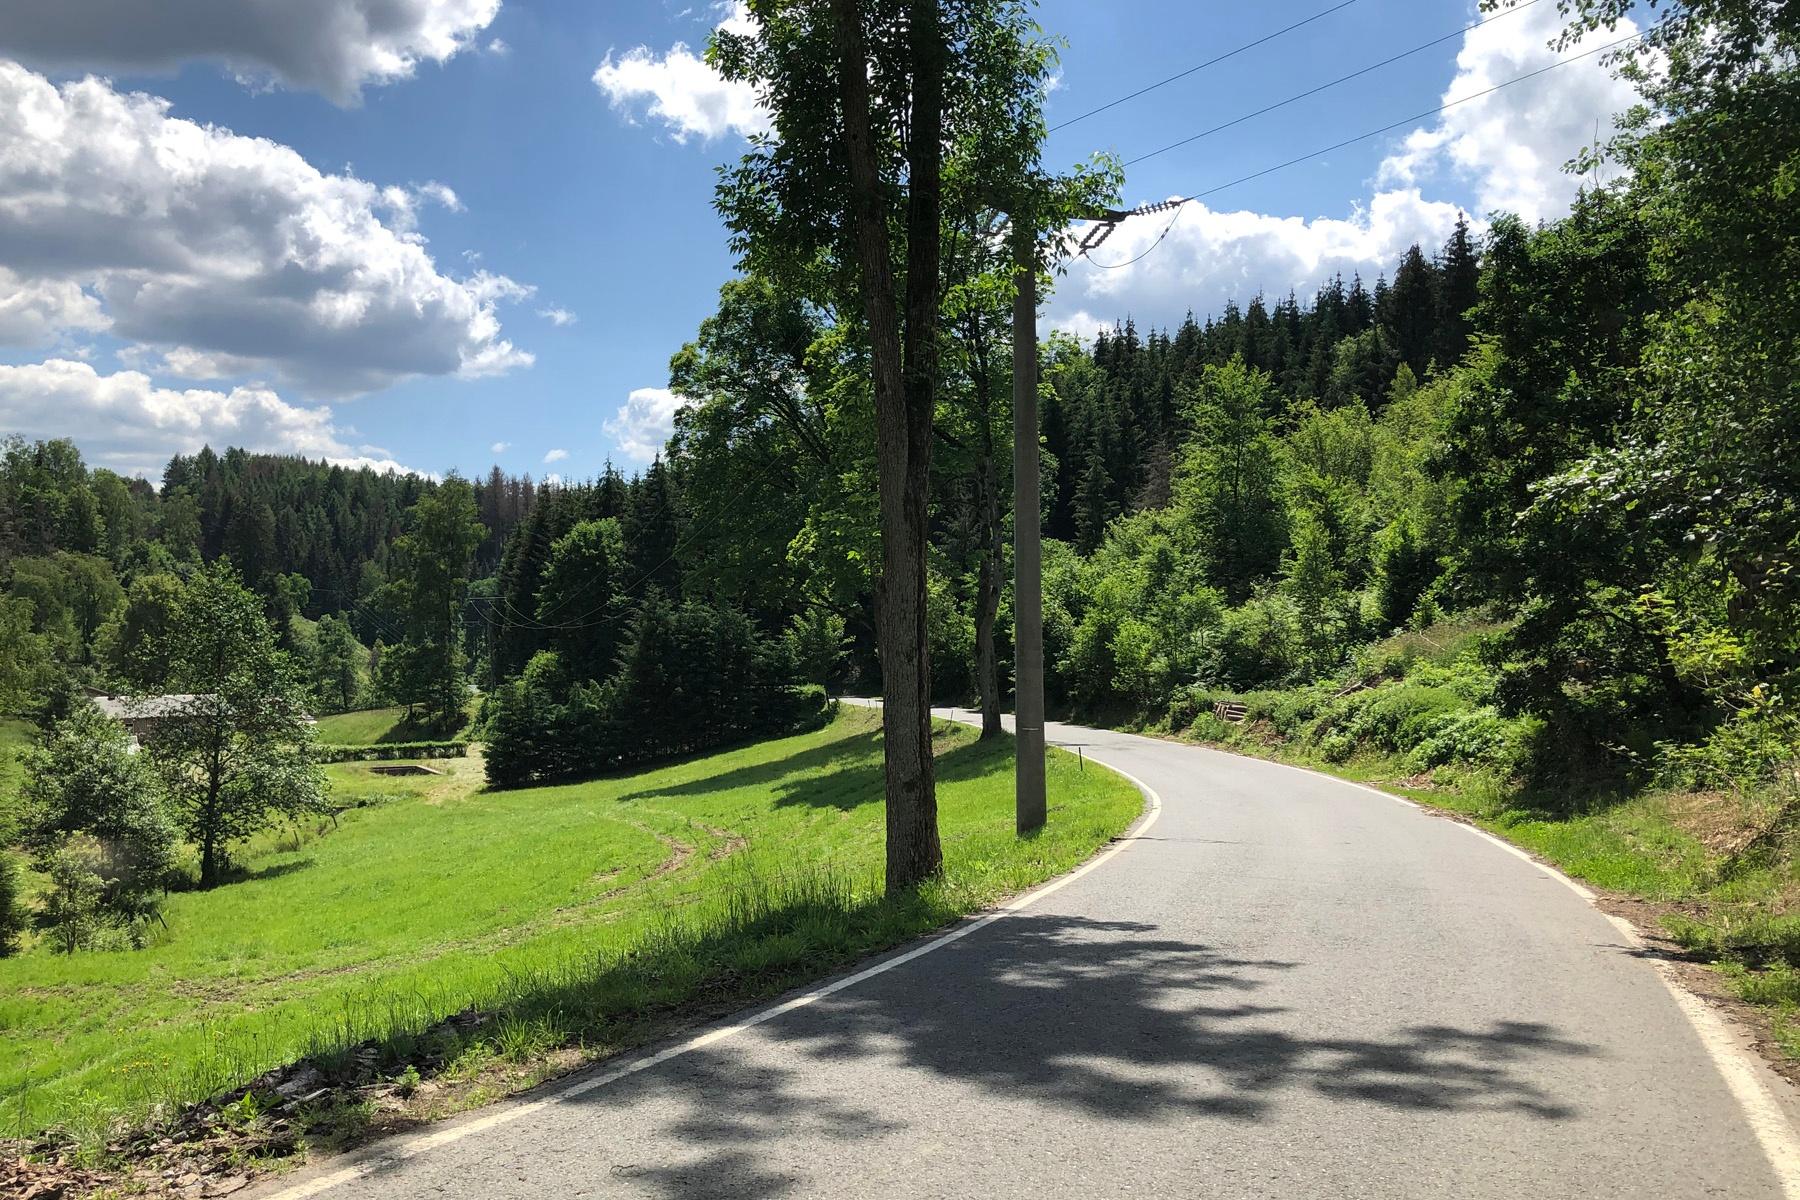 Weg von Saupsdorf nach Hinterhermsdorf